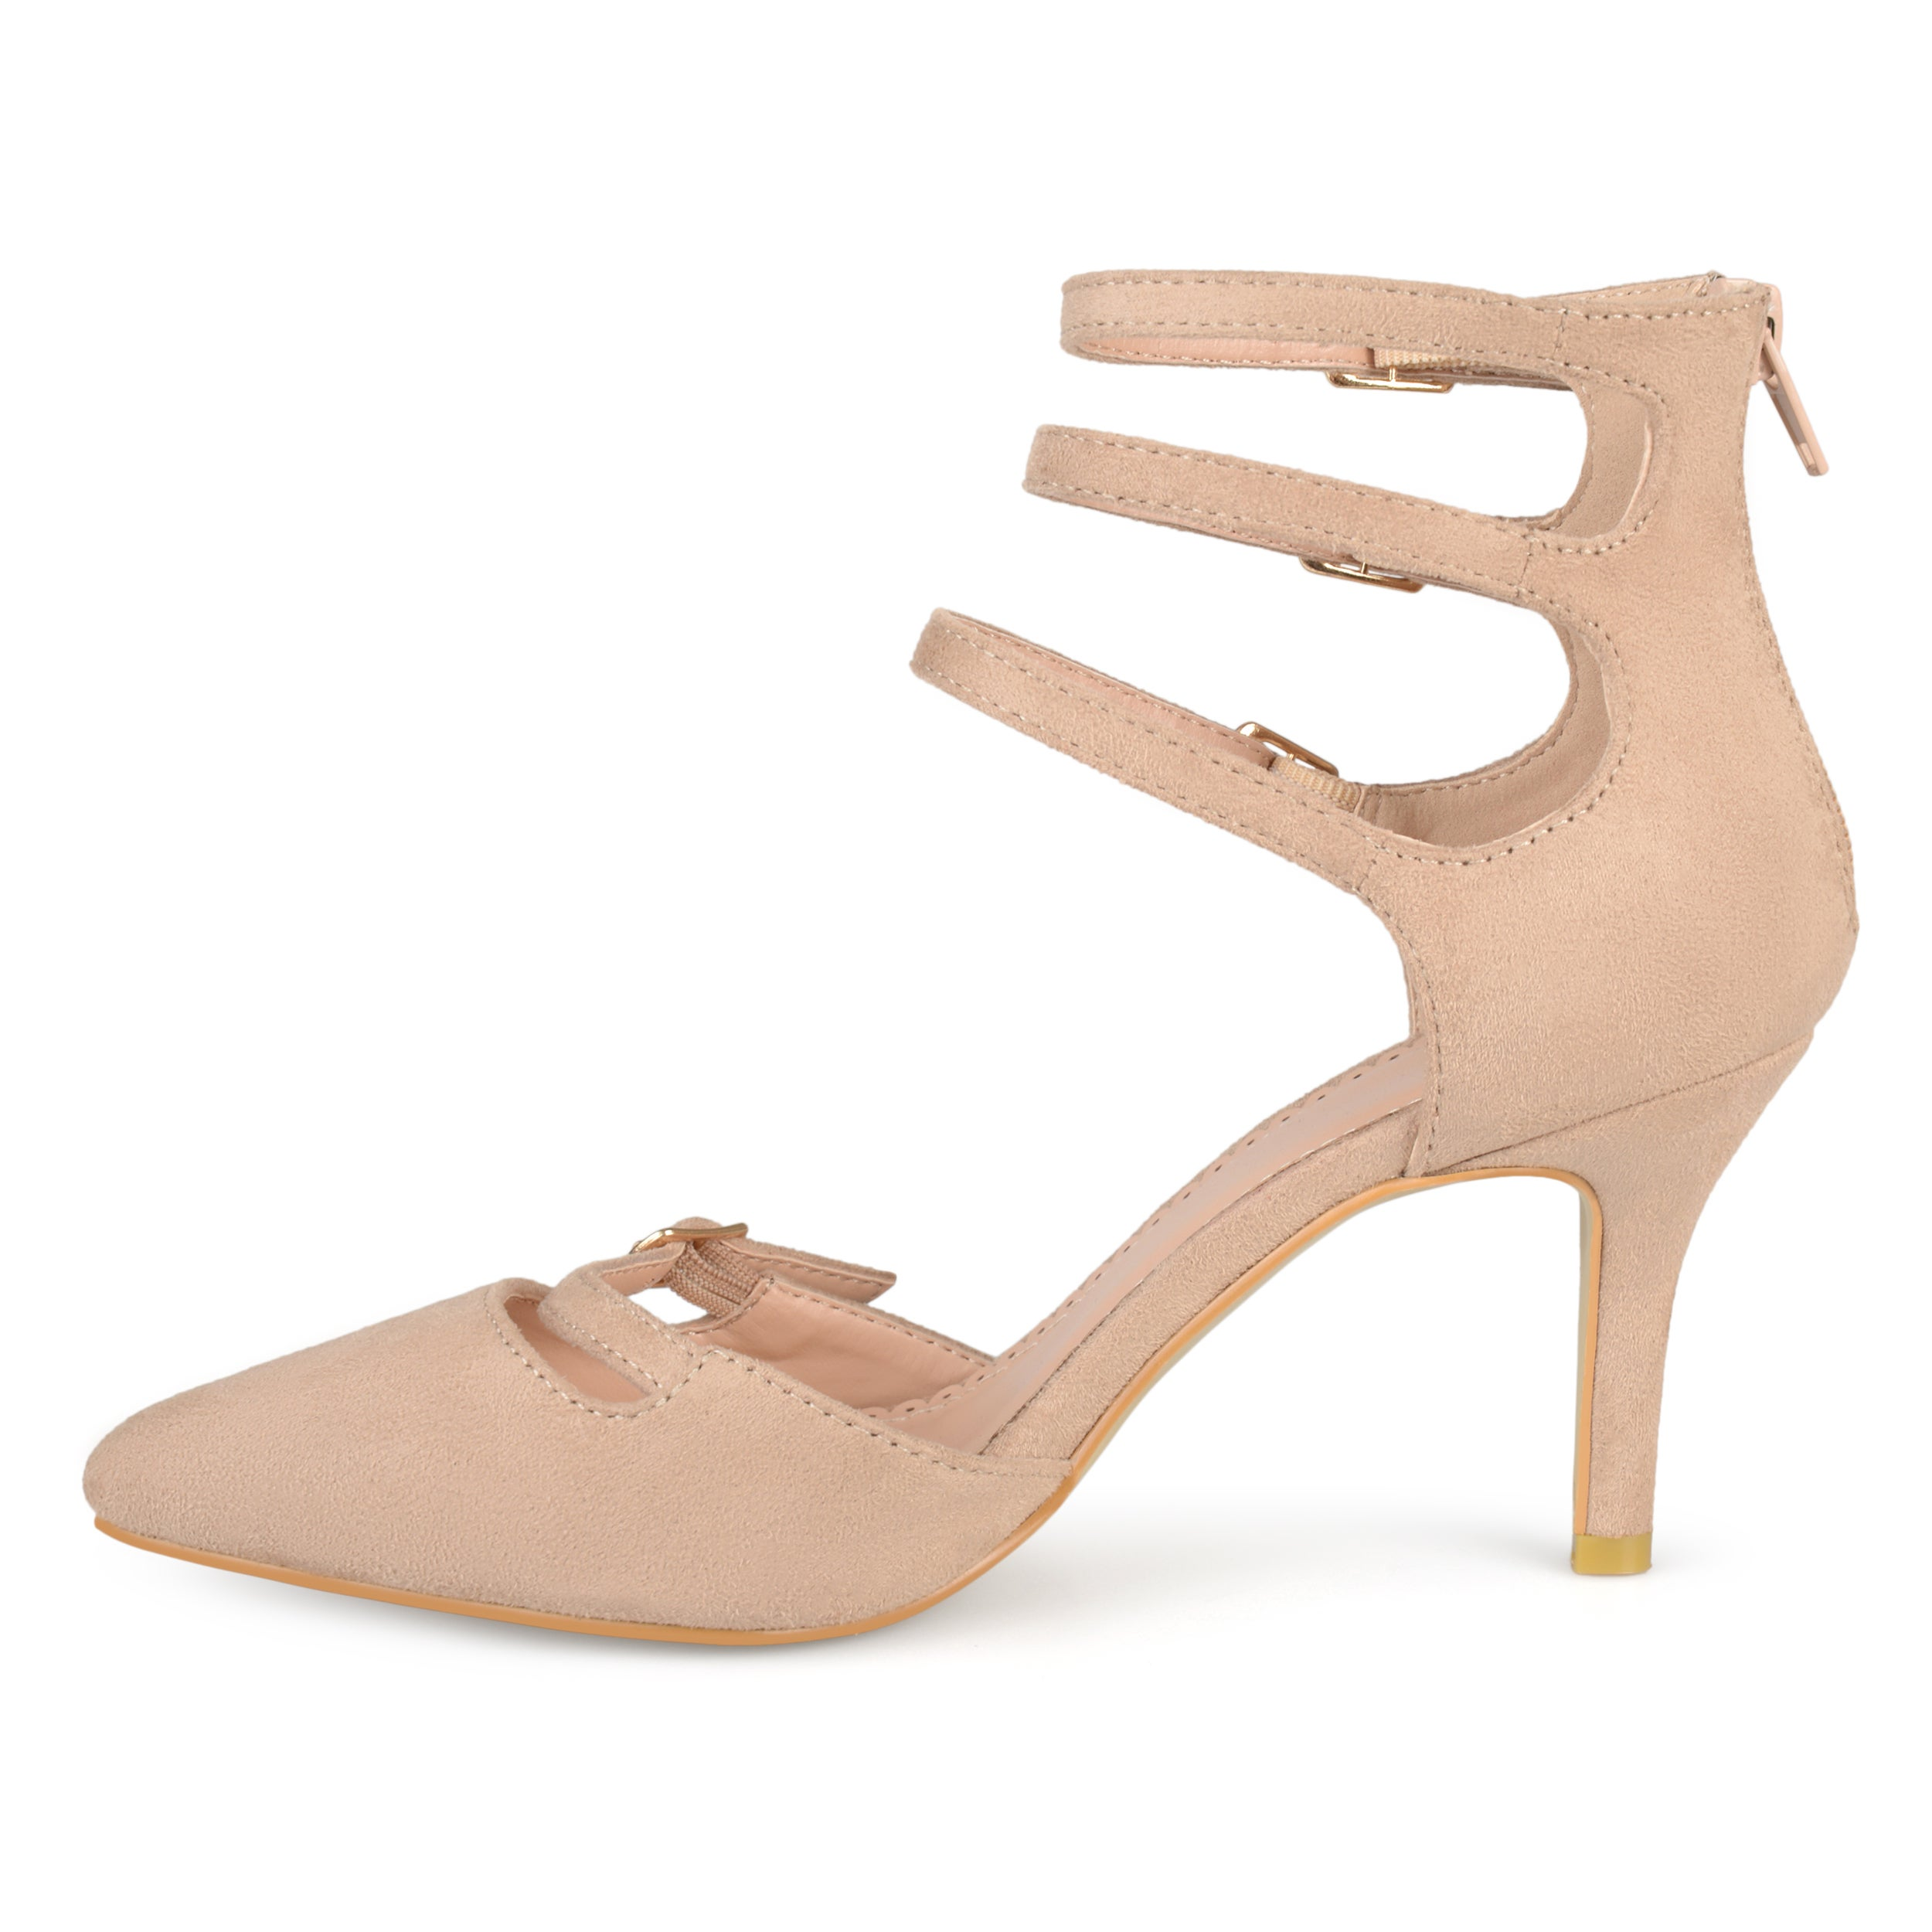 Journee Collection Mariah ... Women's High Heels 8dmB7R